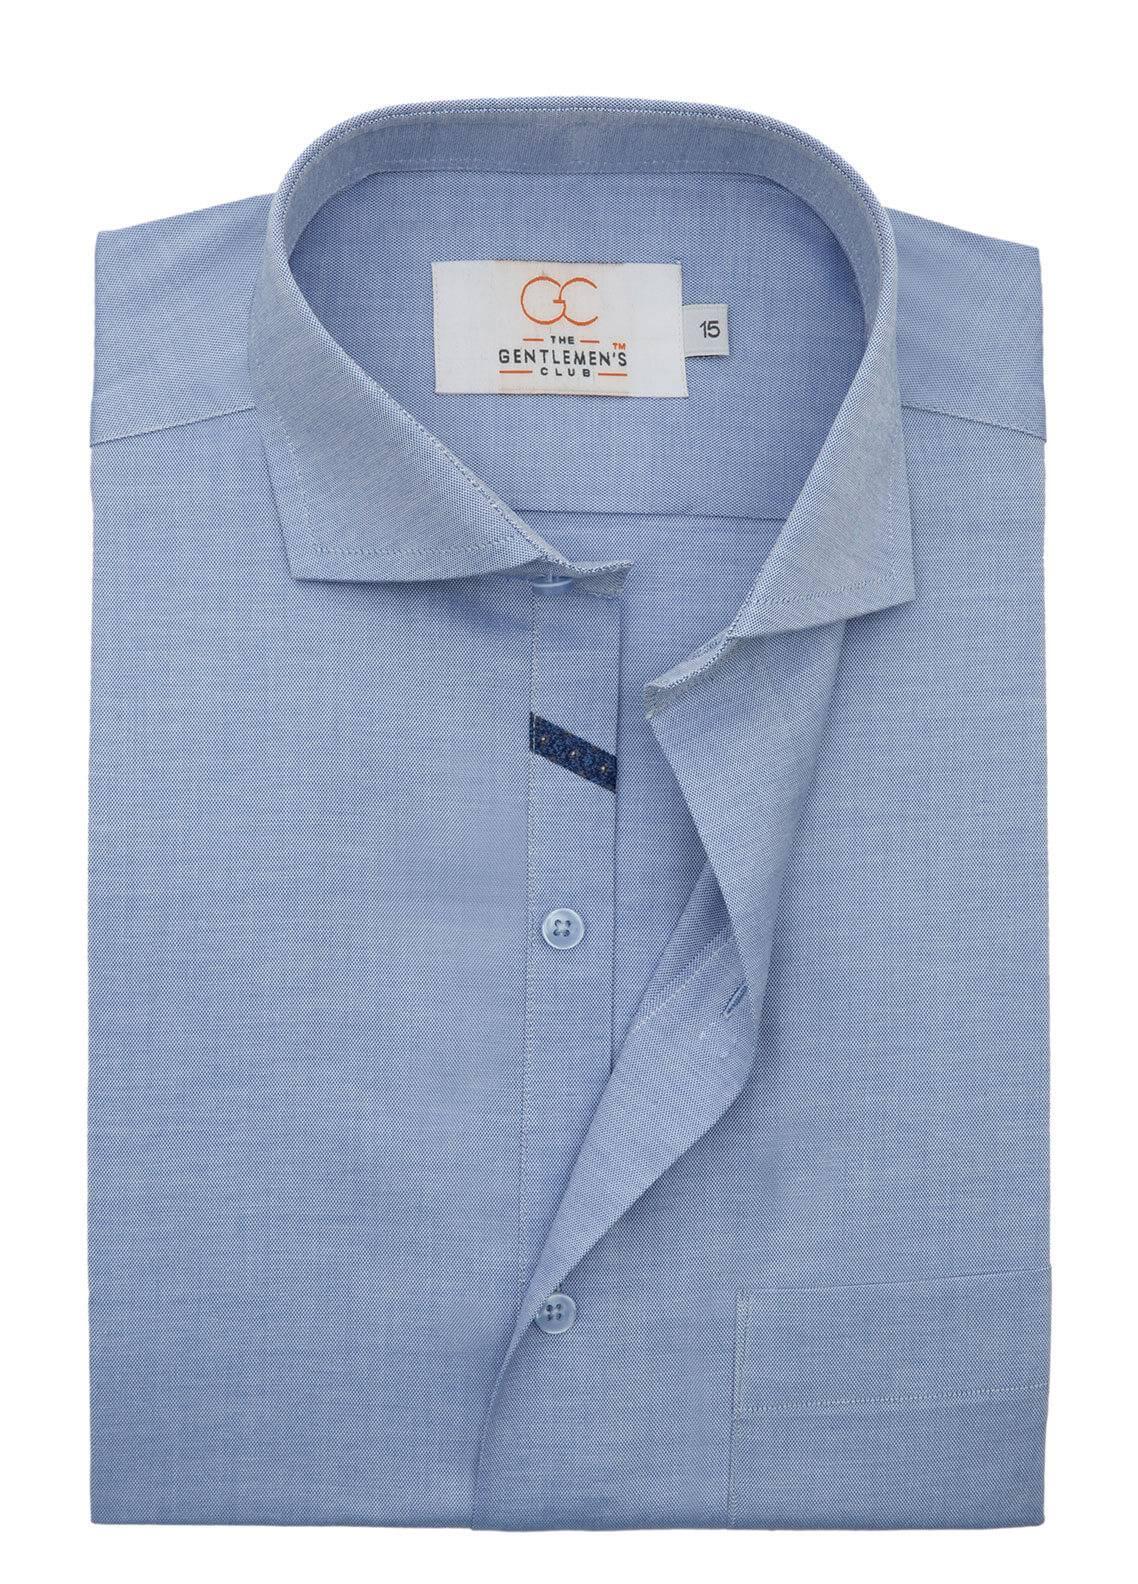 The Gentlemen's Club Cotton Formal Shirts for Men - Blue White Label 4076 - 18.5